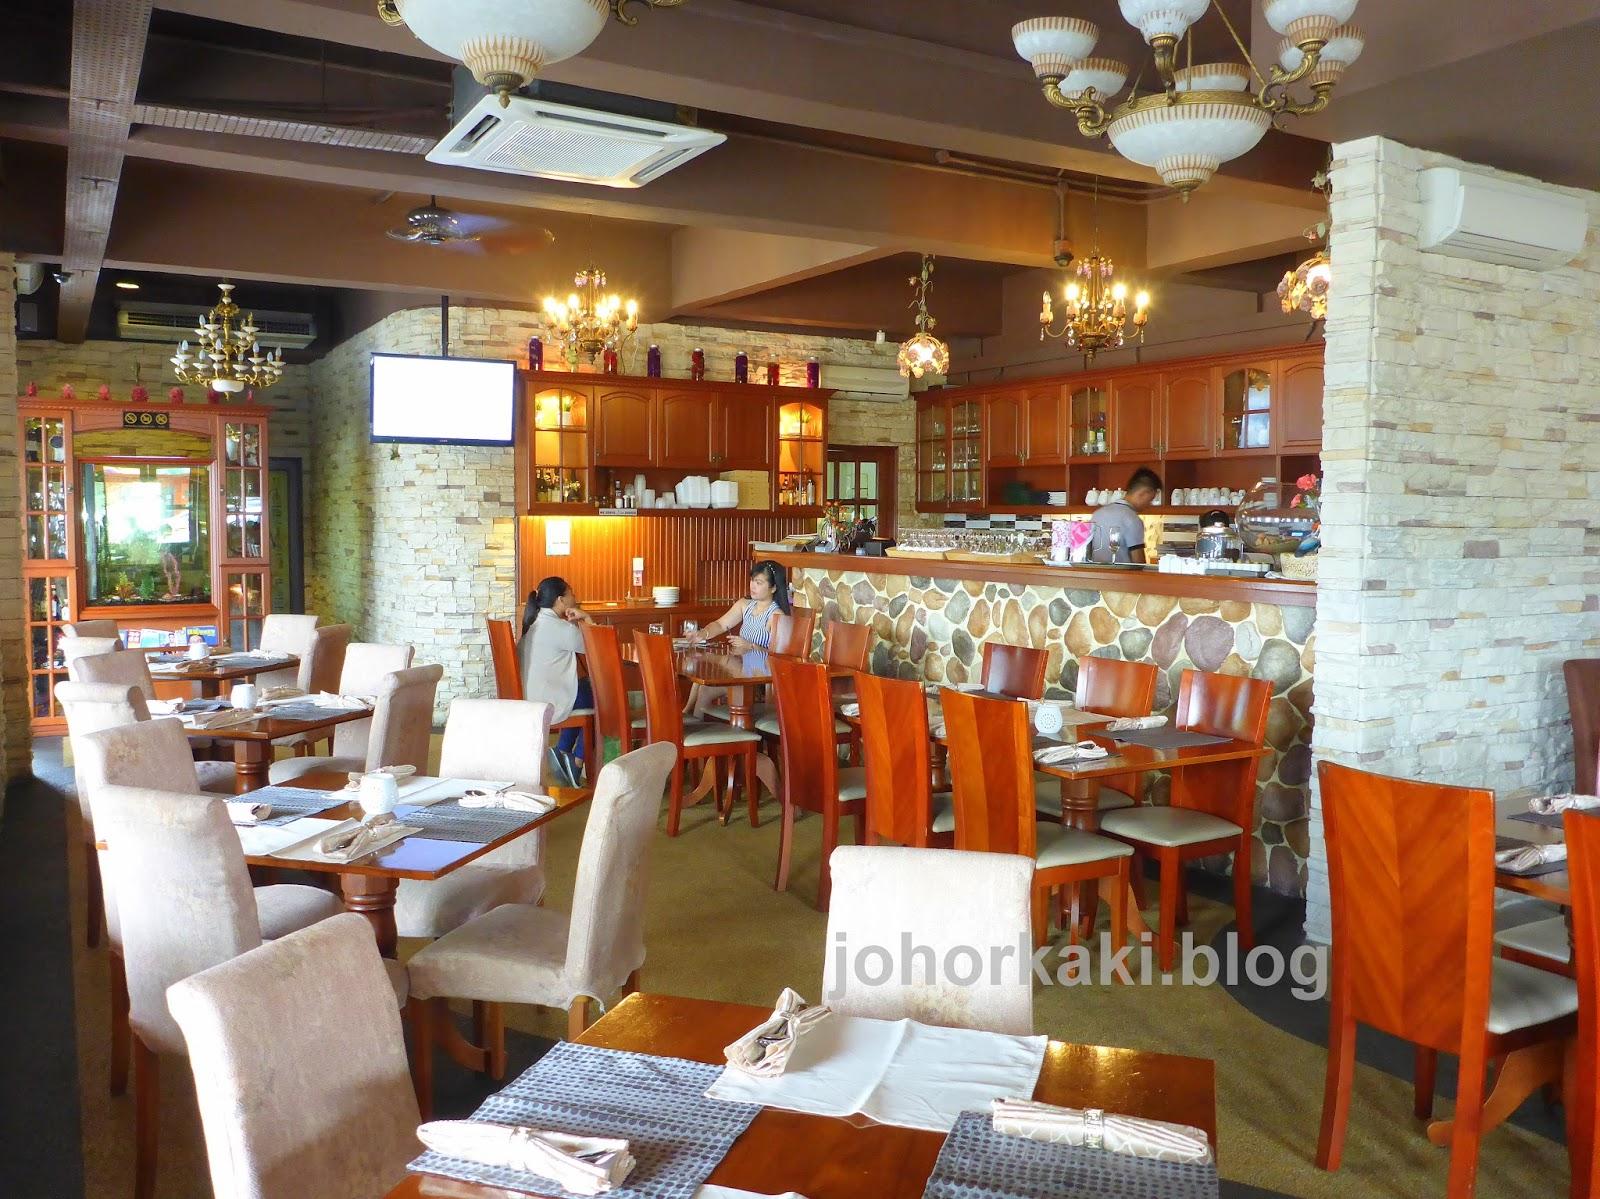 Restaurant Furniture Johor : Vilaggio restaurant in skudai johor bahru ⭐⭐⭐ kaki